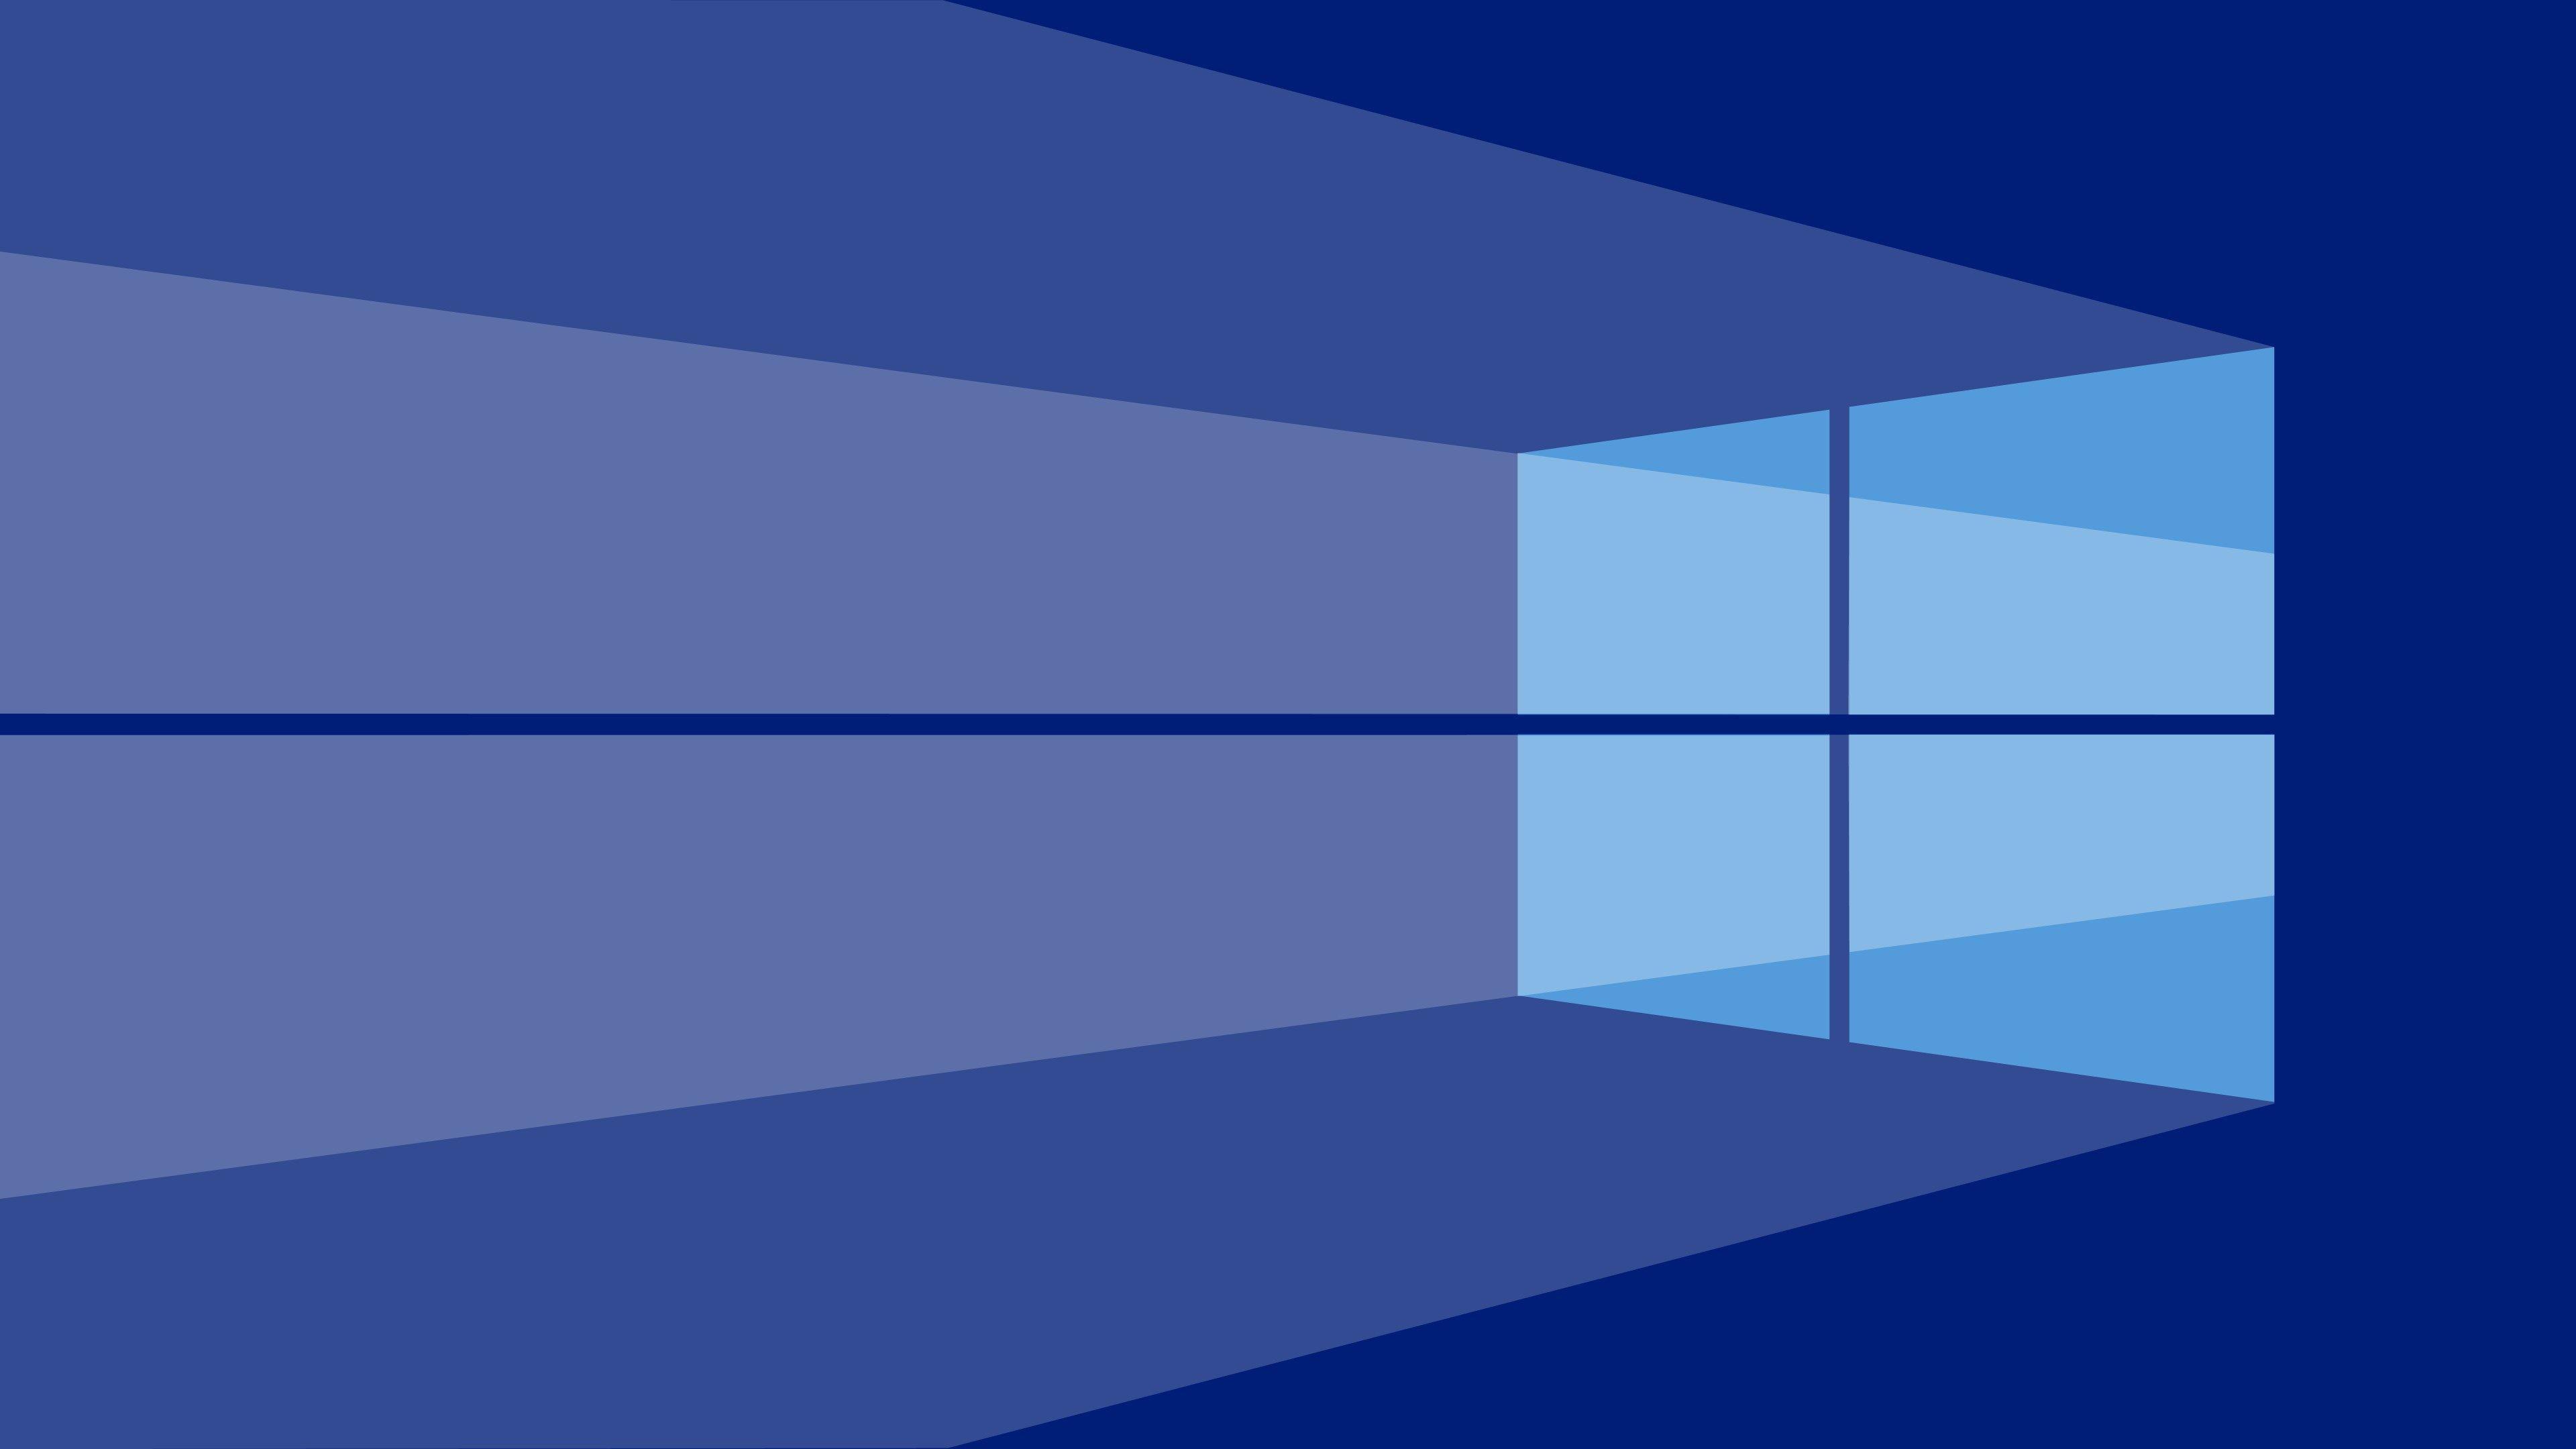 windows 10 4k wallpaper (38402160) 4K, 2020 Windows 10